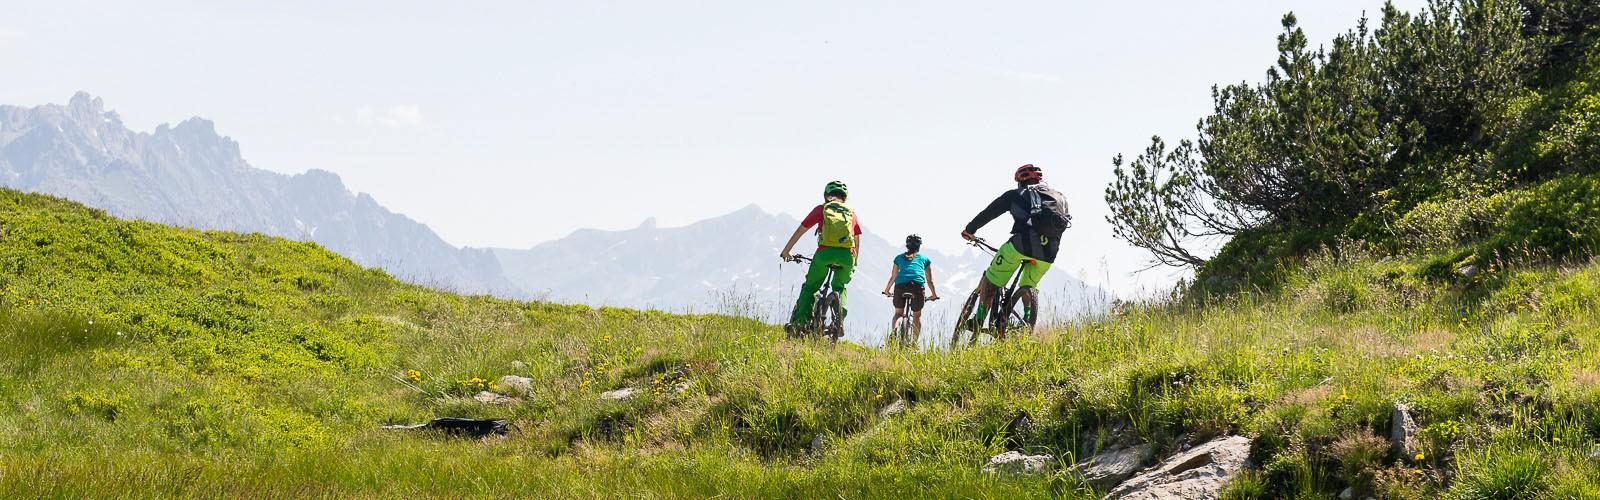 Sport Milanovic - Scott e-bike Verleih